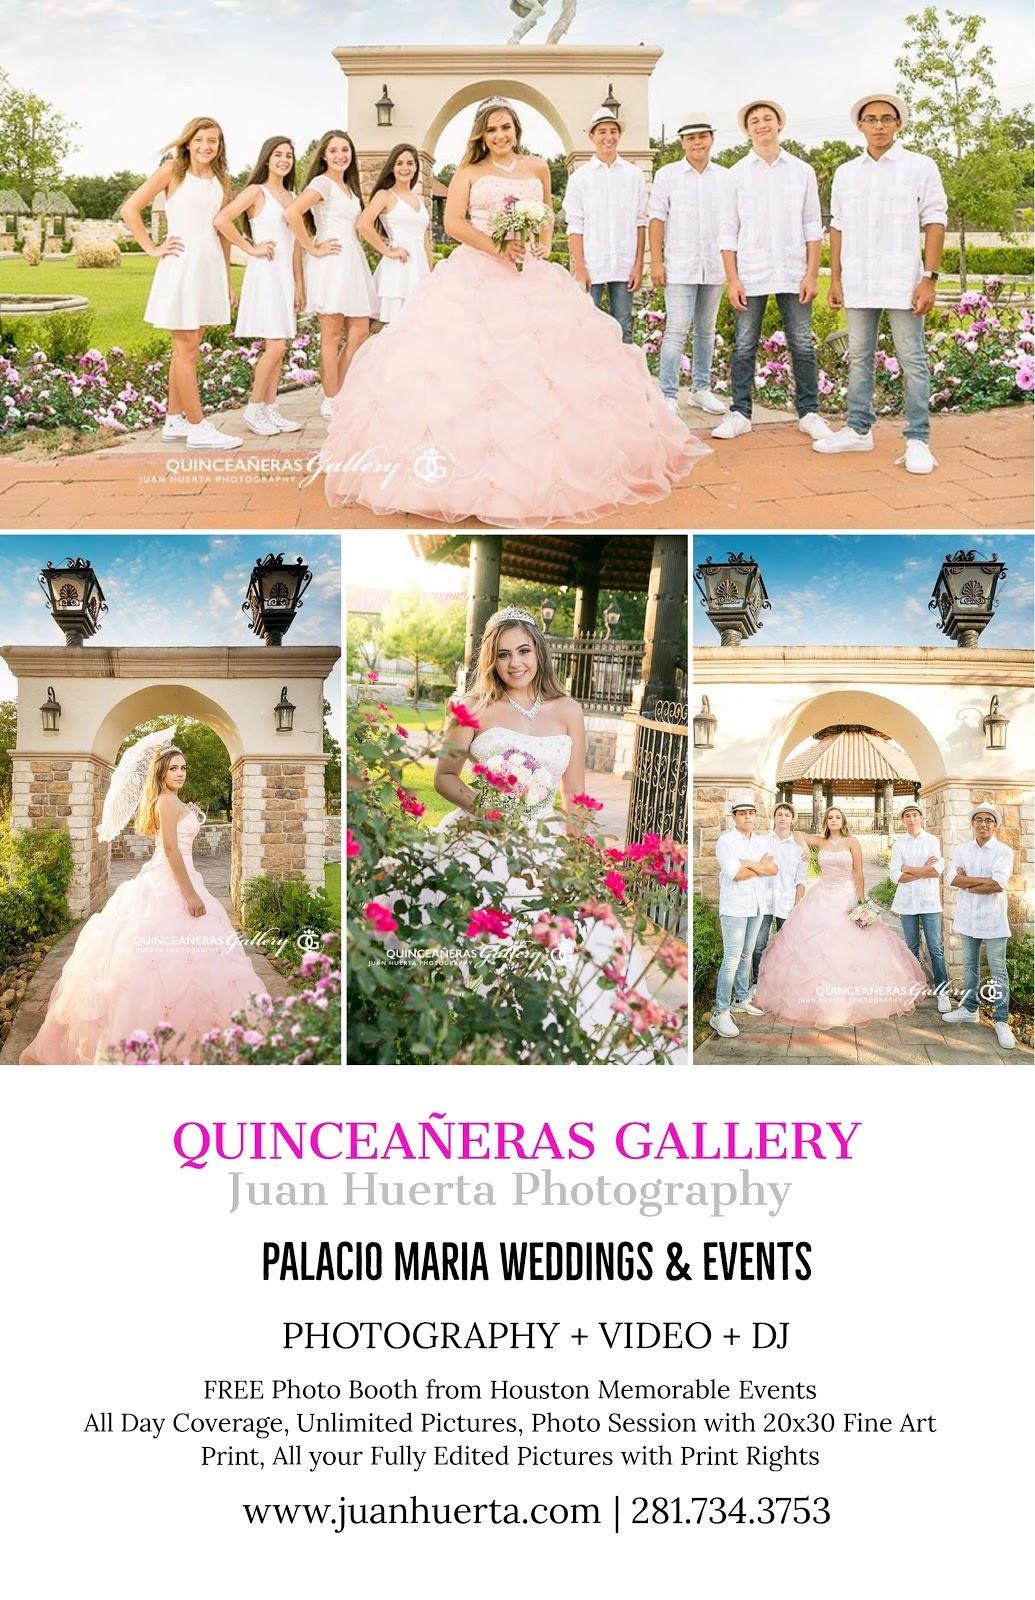 fotografo-videografo-quinceaneras-gallery-katy-texas